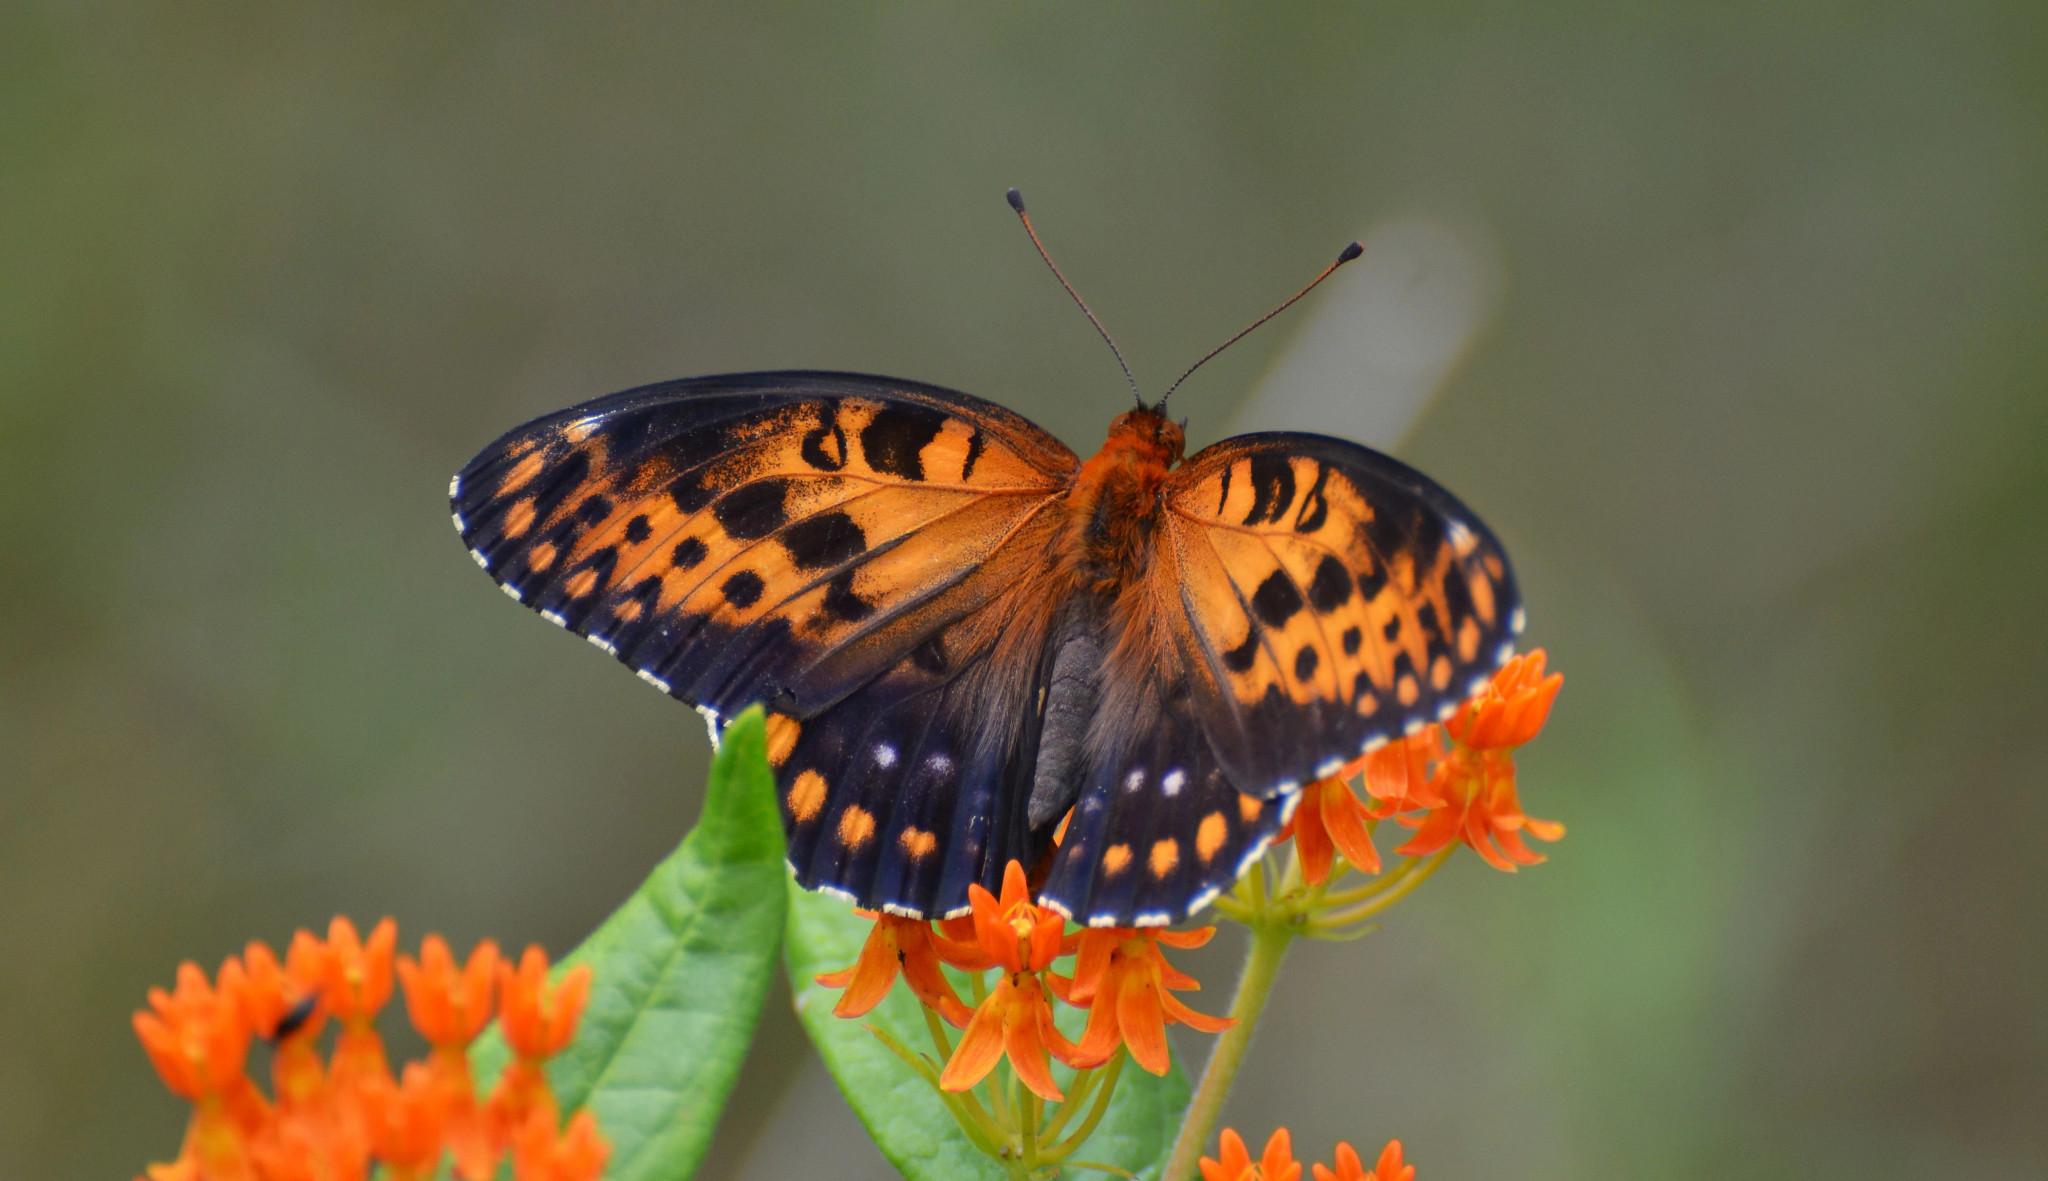 close up of regal fritillary butterfly landing on flower